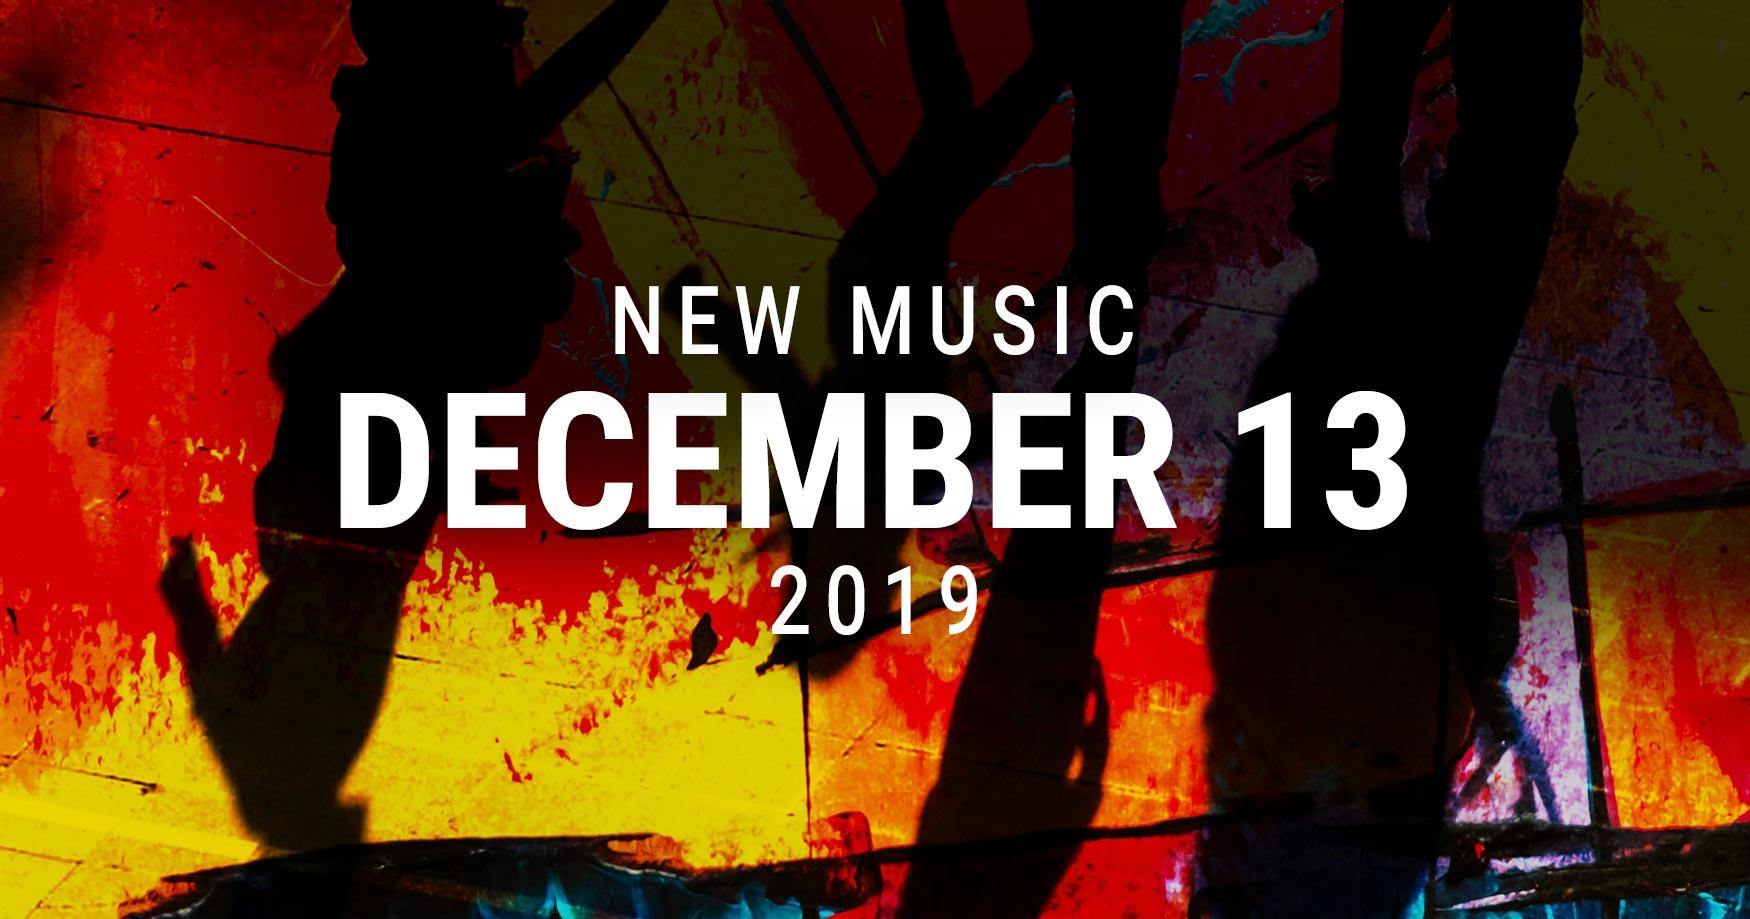 New Music December 13 2019